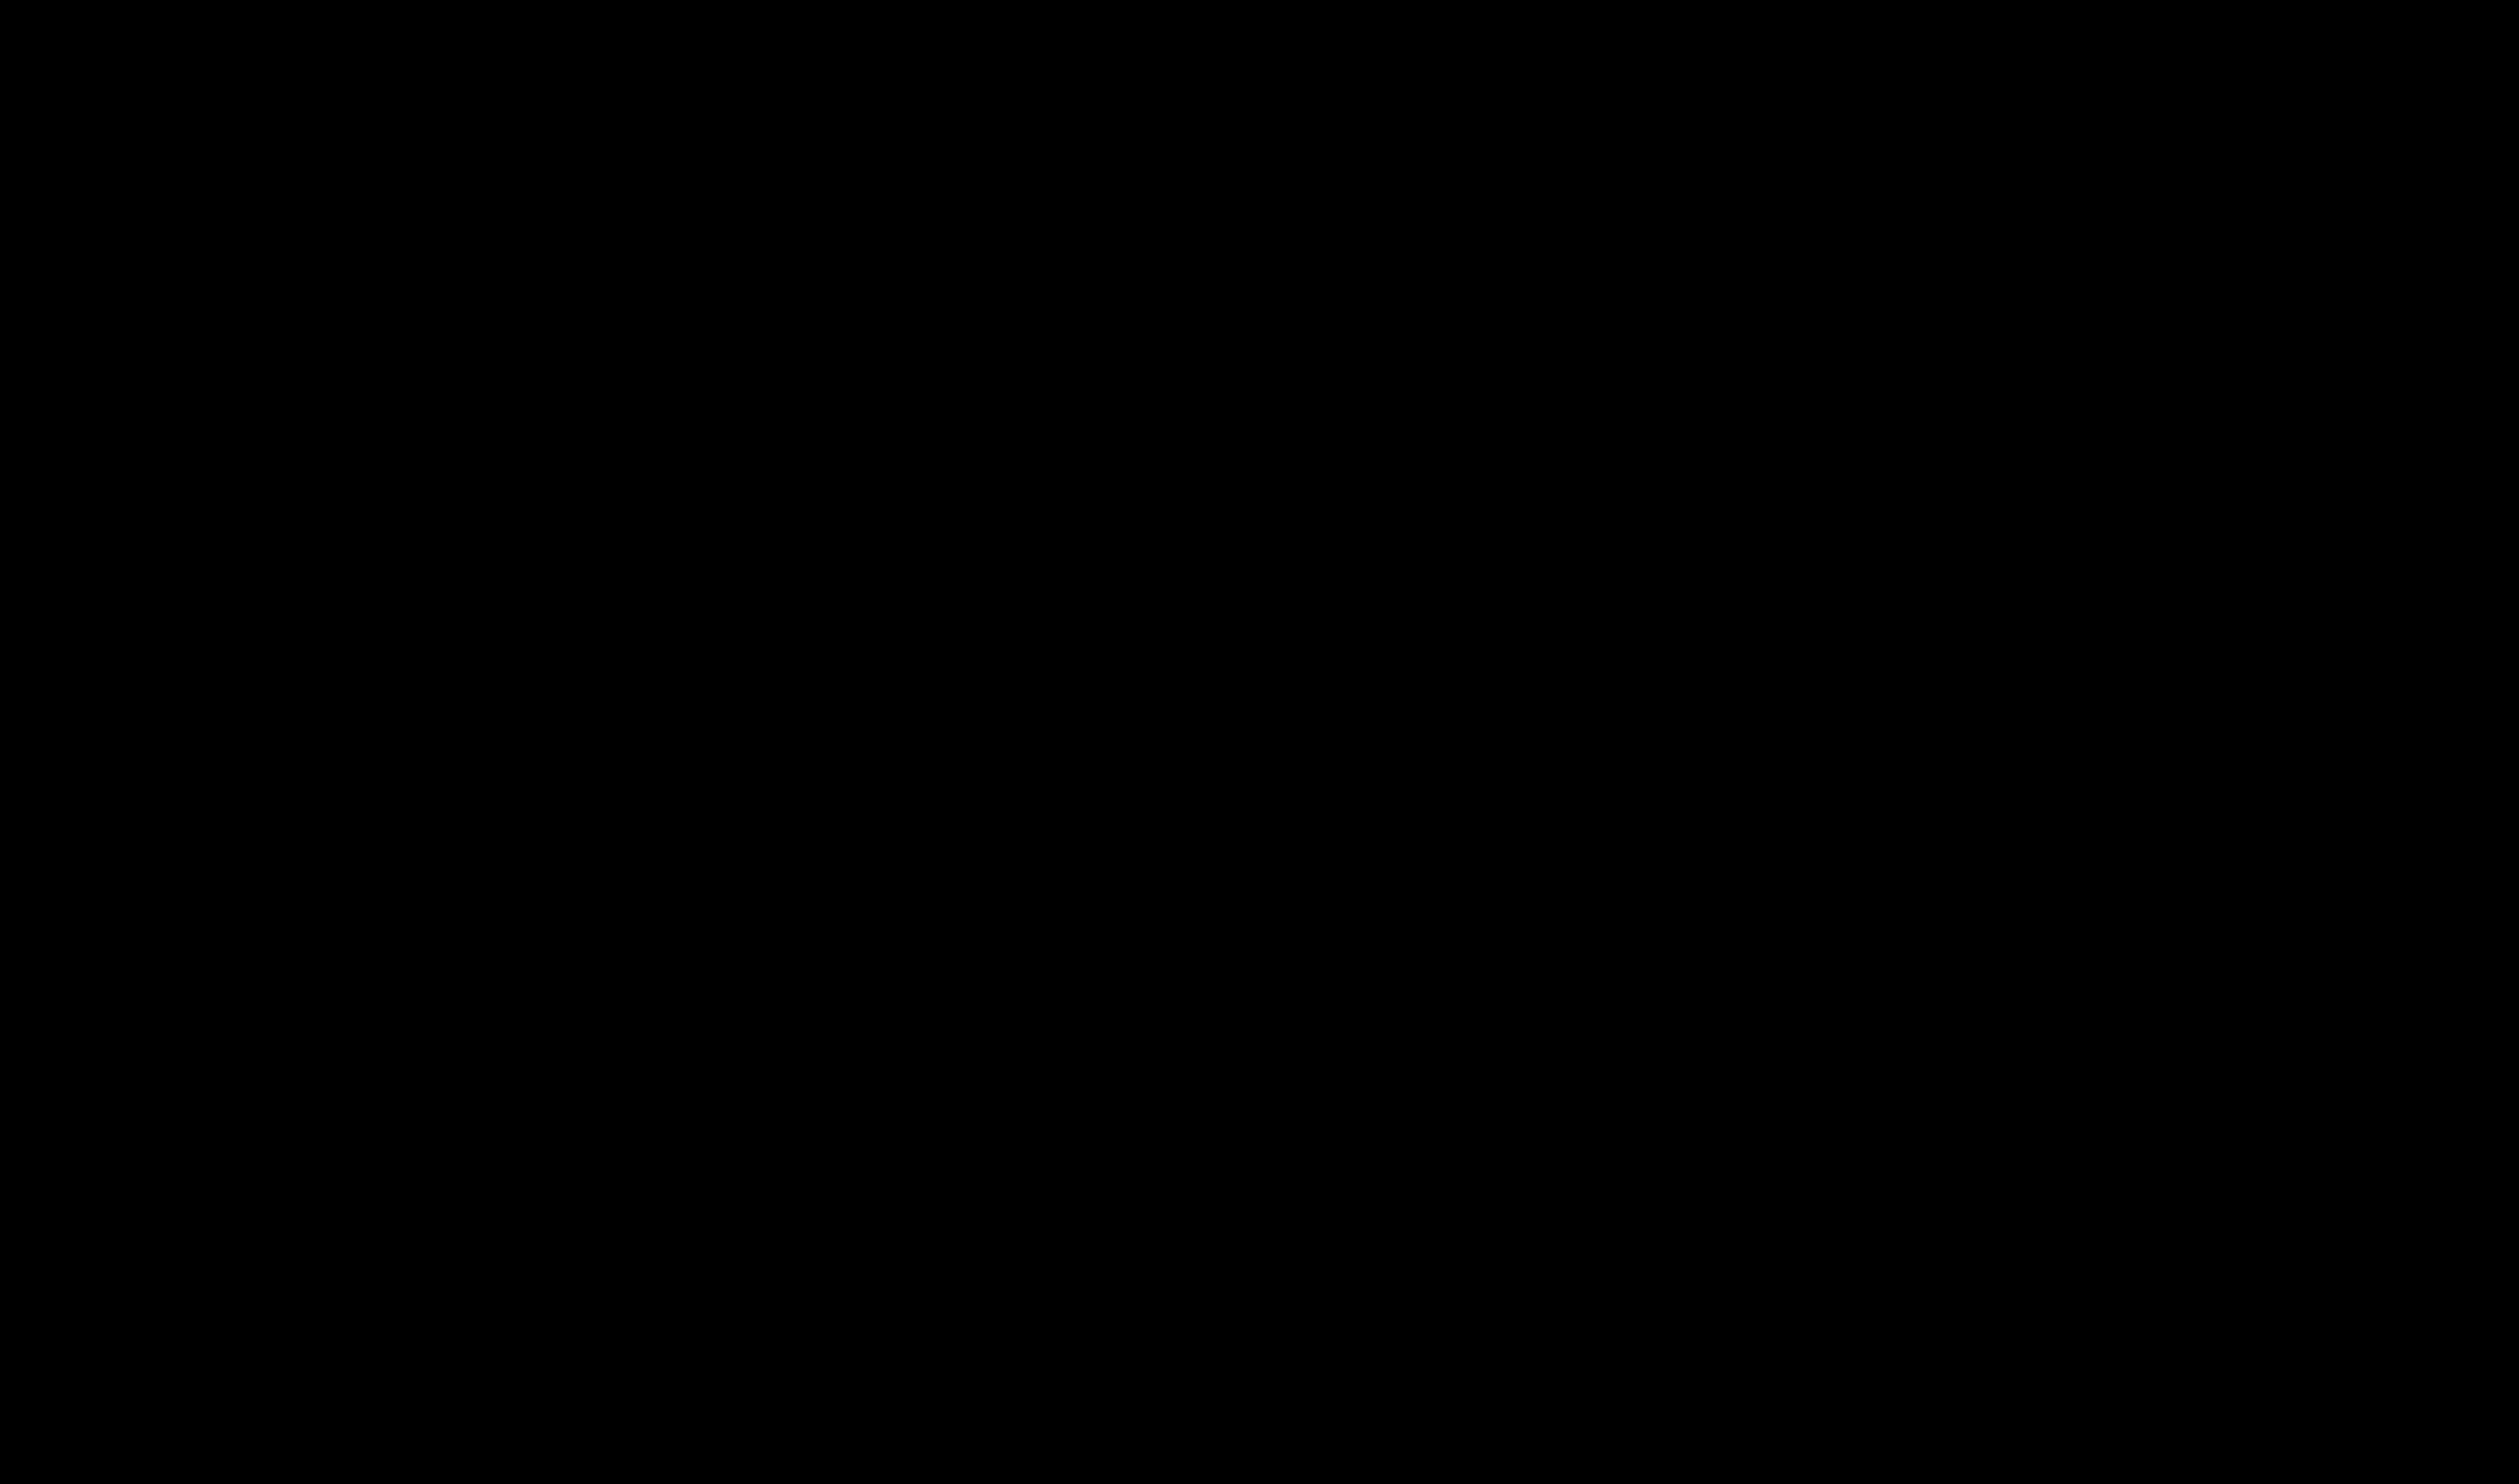 Schwarzwälder Hausbrot